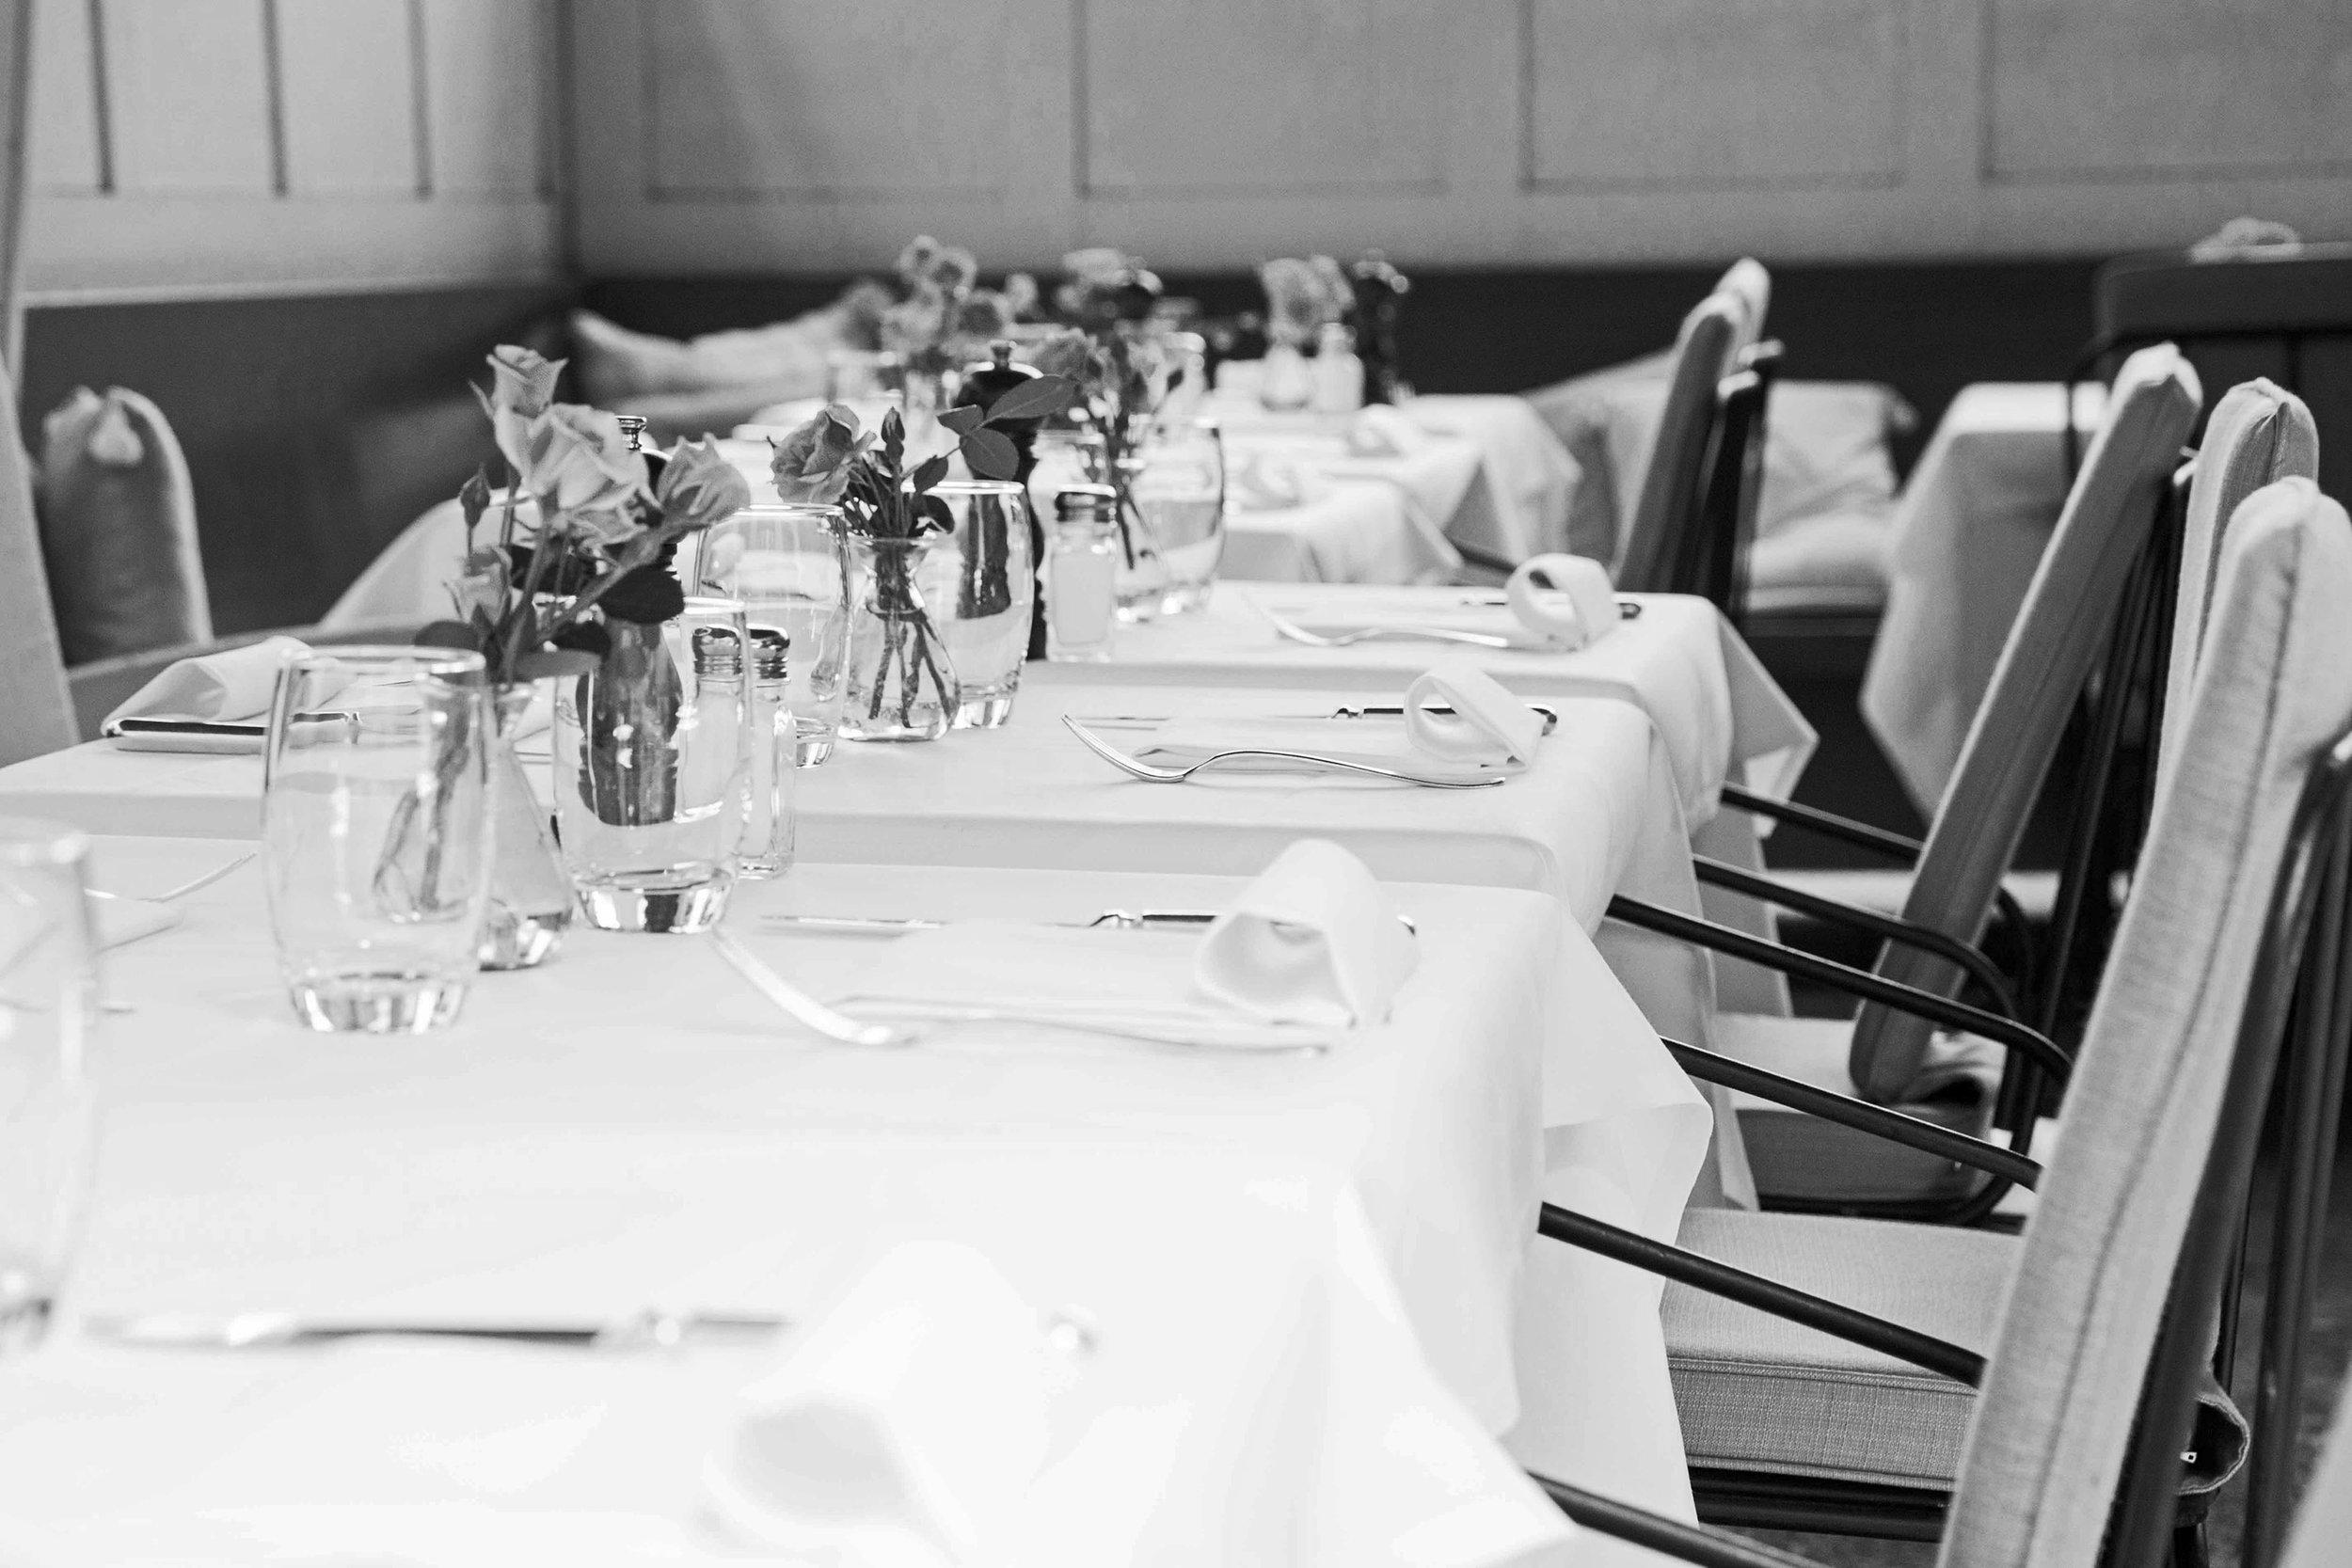 rosalys-restaurant-bar-zuerich-garten-sitzplatz